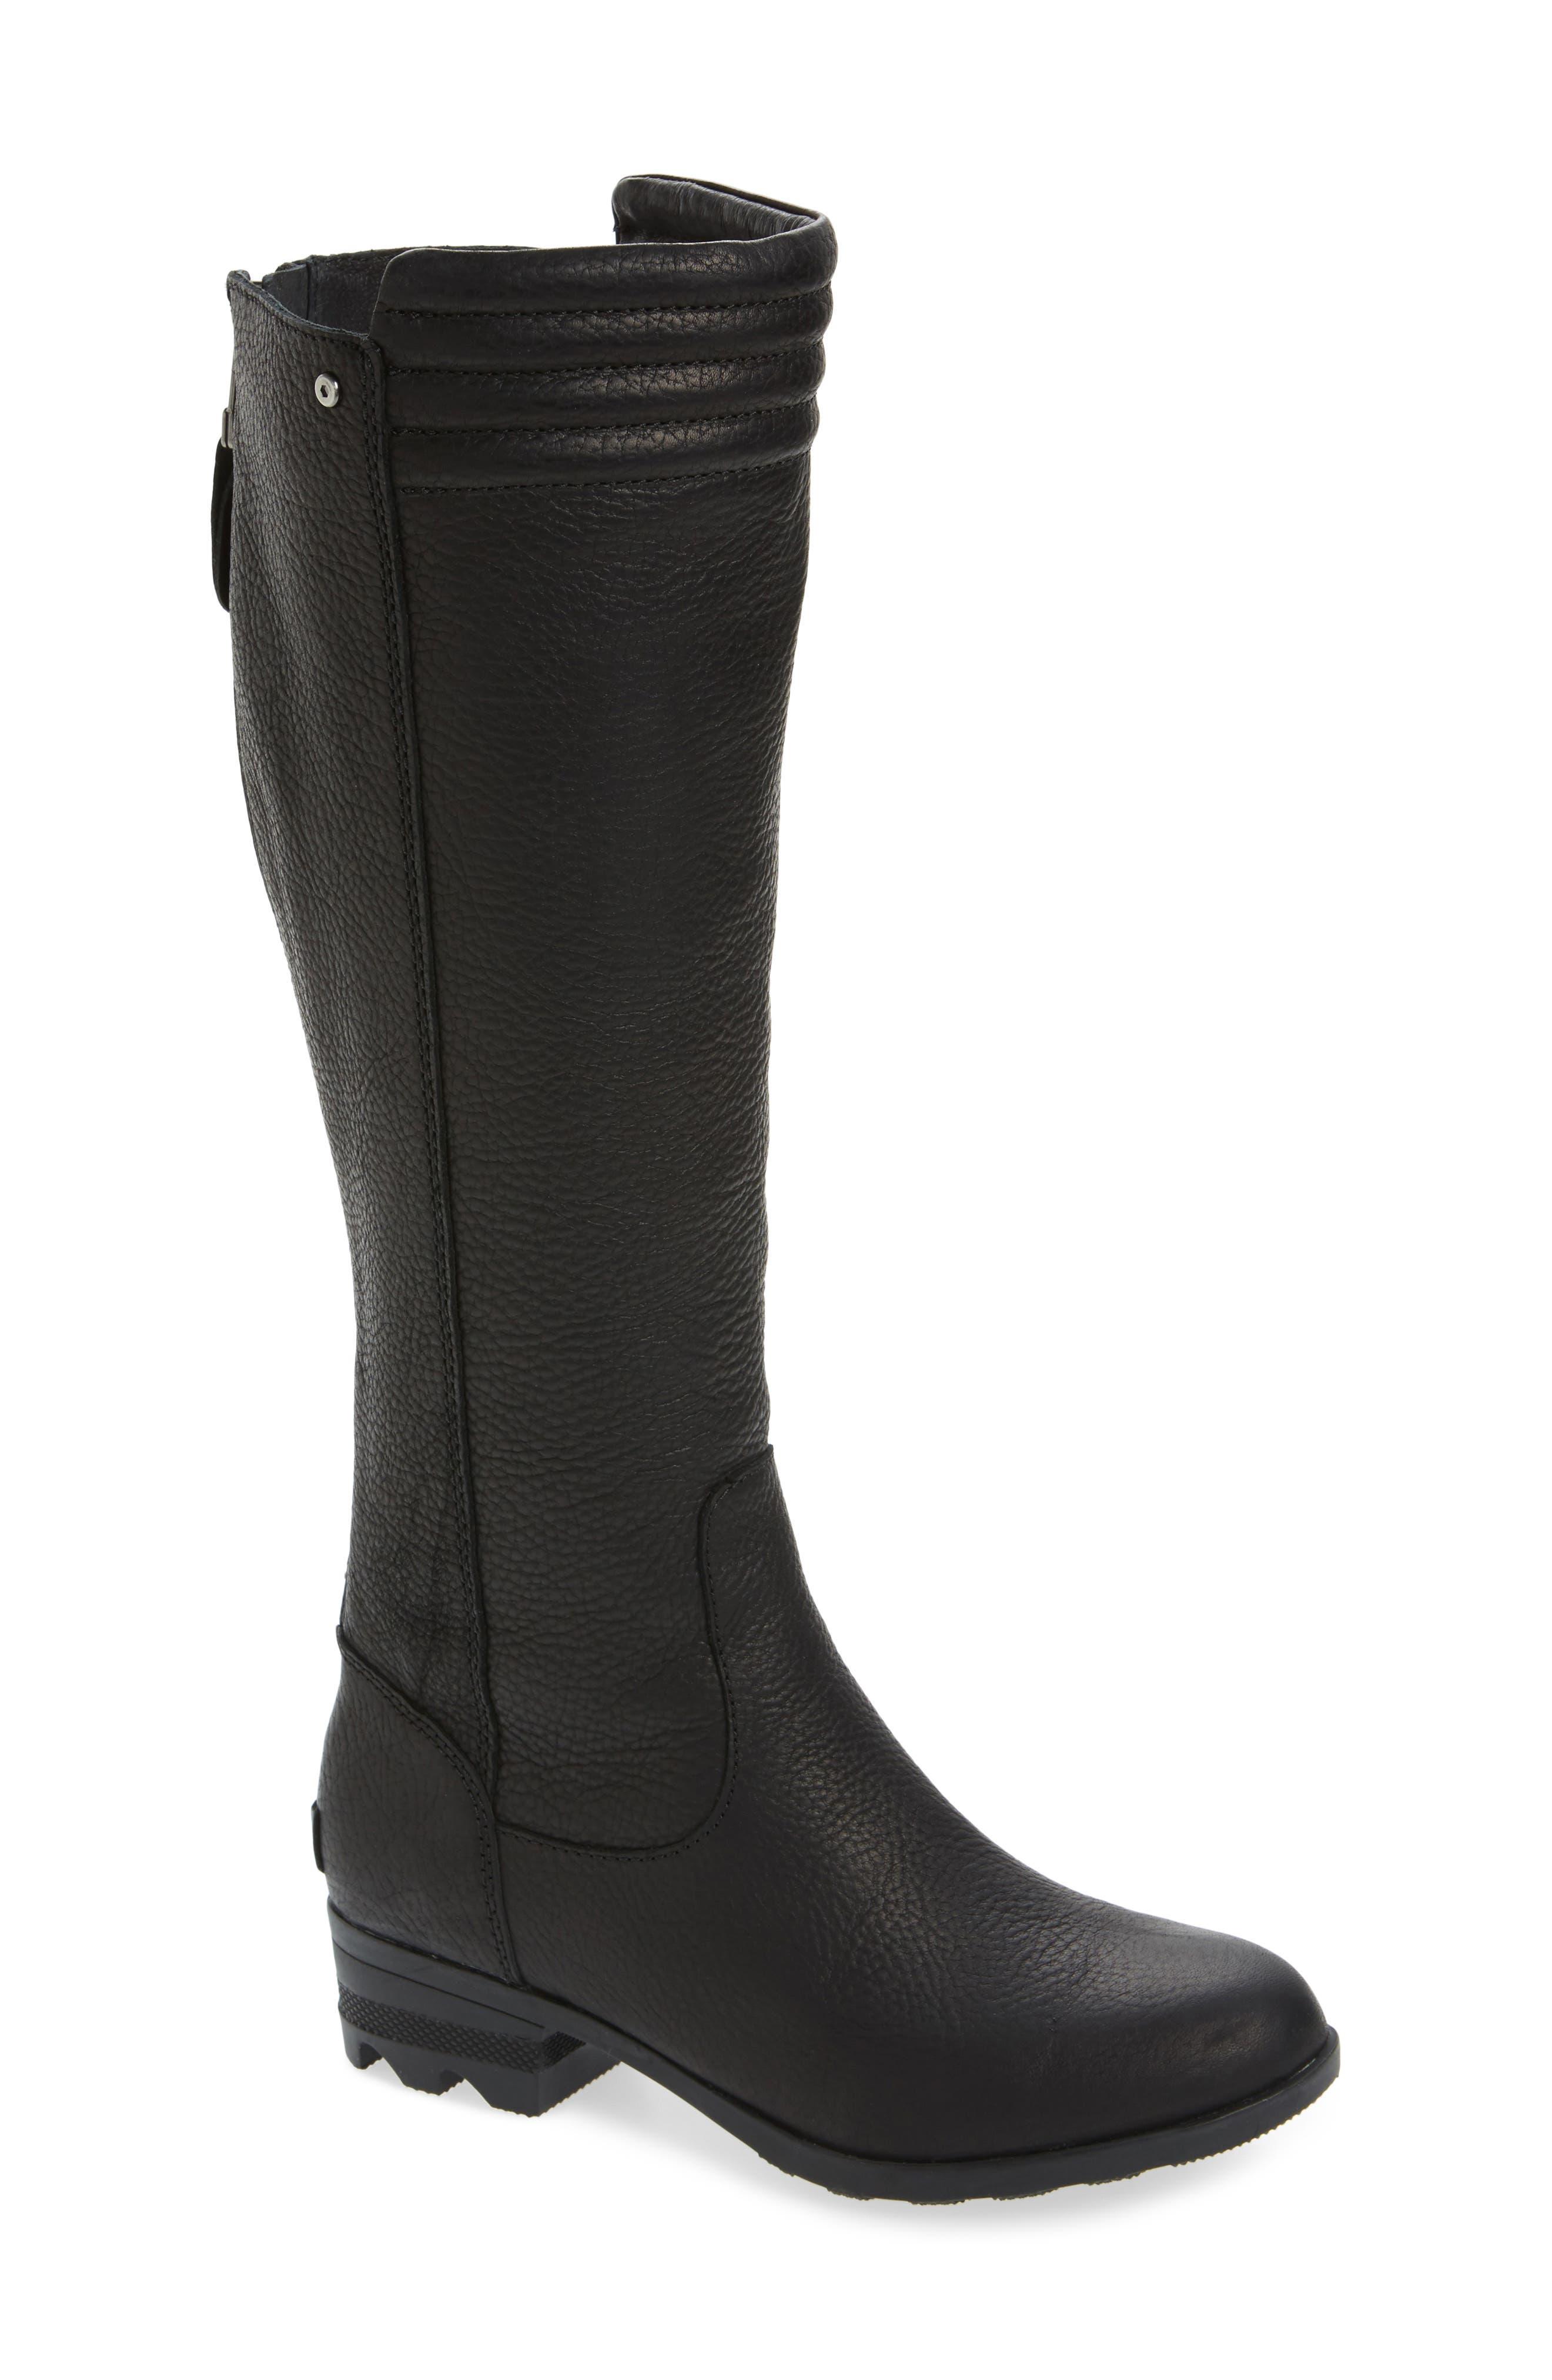 Danica Waterproof Knee High Boot,                         Main,                         color, 010